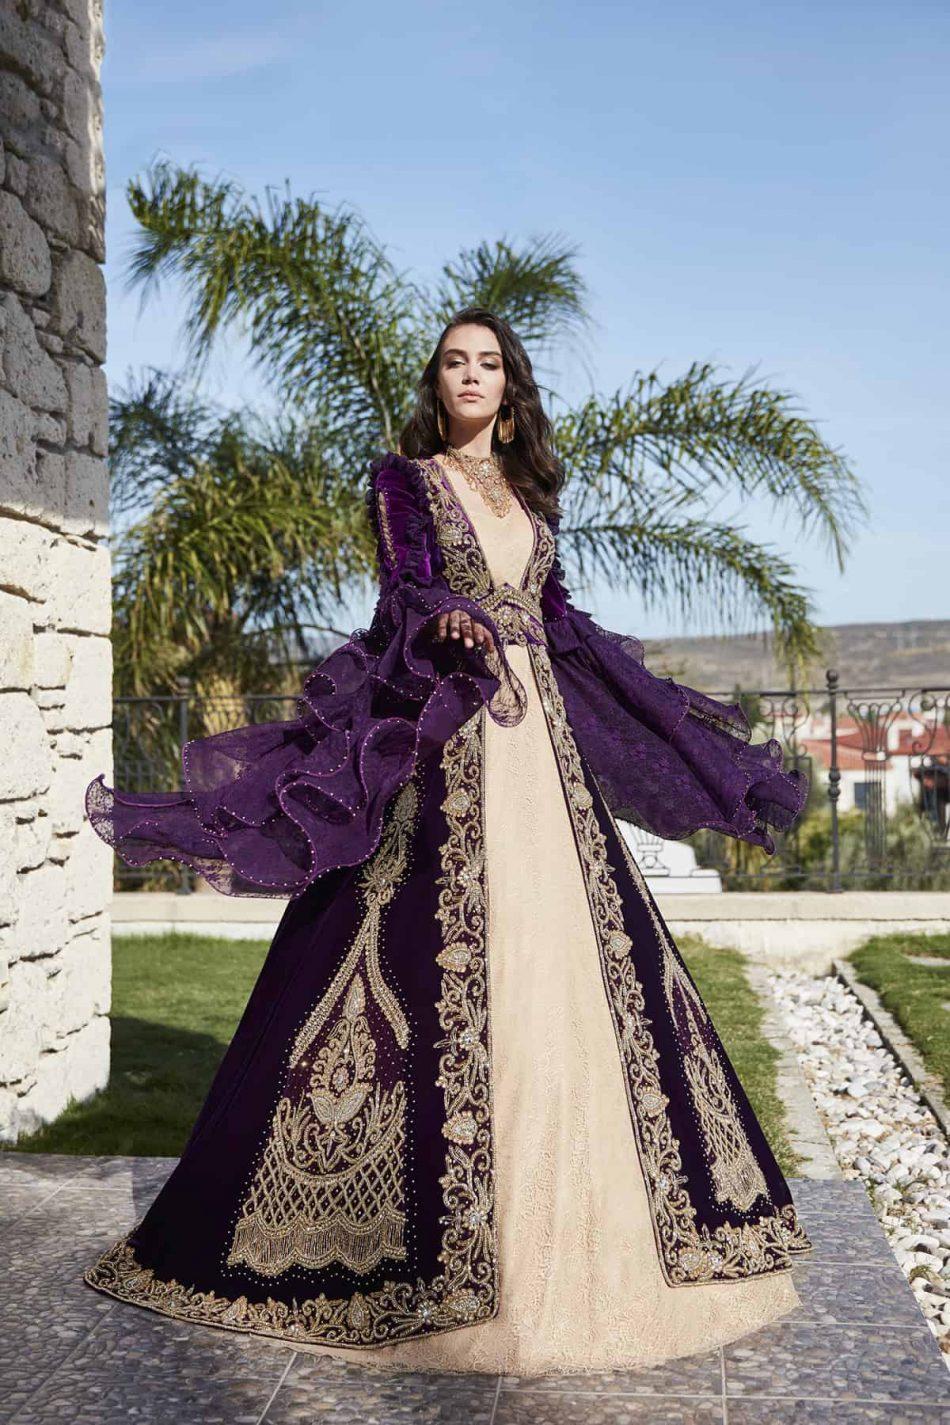 luxury designer formal evening prom party caftan dresses